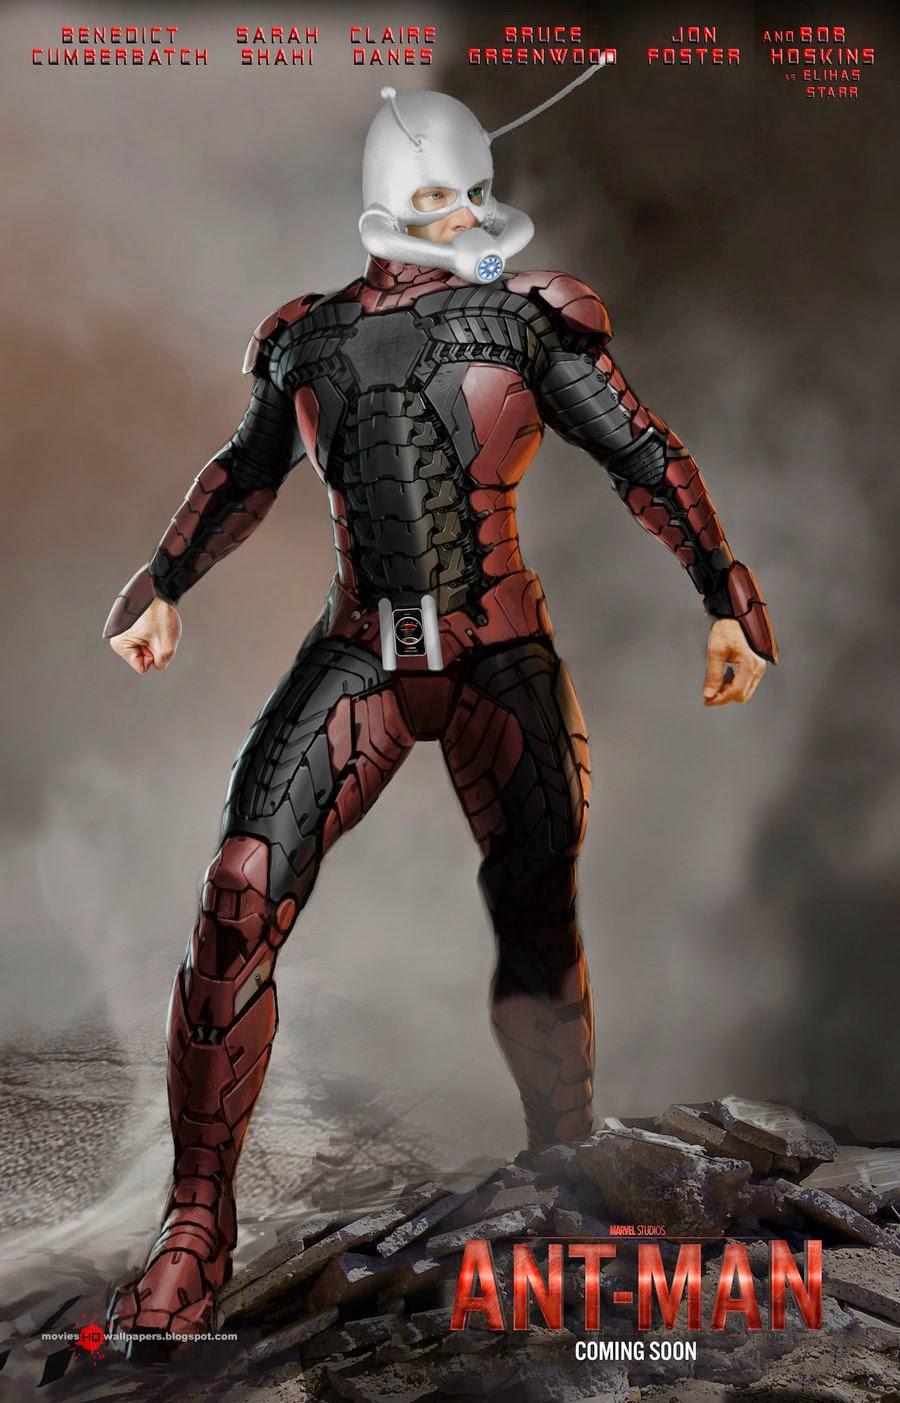 Cool Scott Lang Infinity War Wallpaper - Marvel%2BAnt%2BMan%2B2015%2BHD%2Bmovieshqwallpapers  Snapshot_51648 .jpg